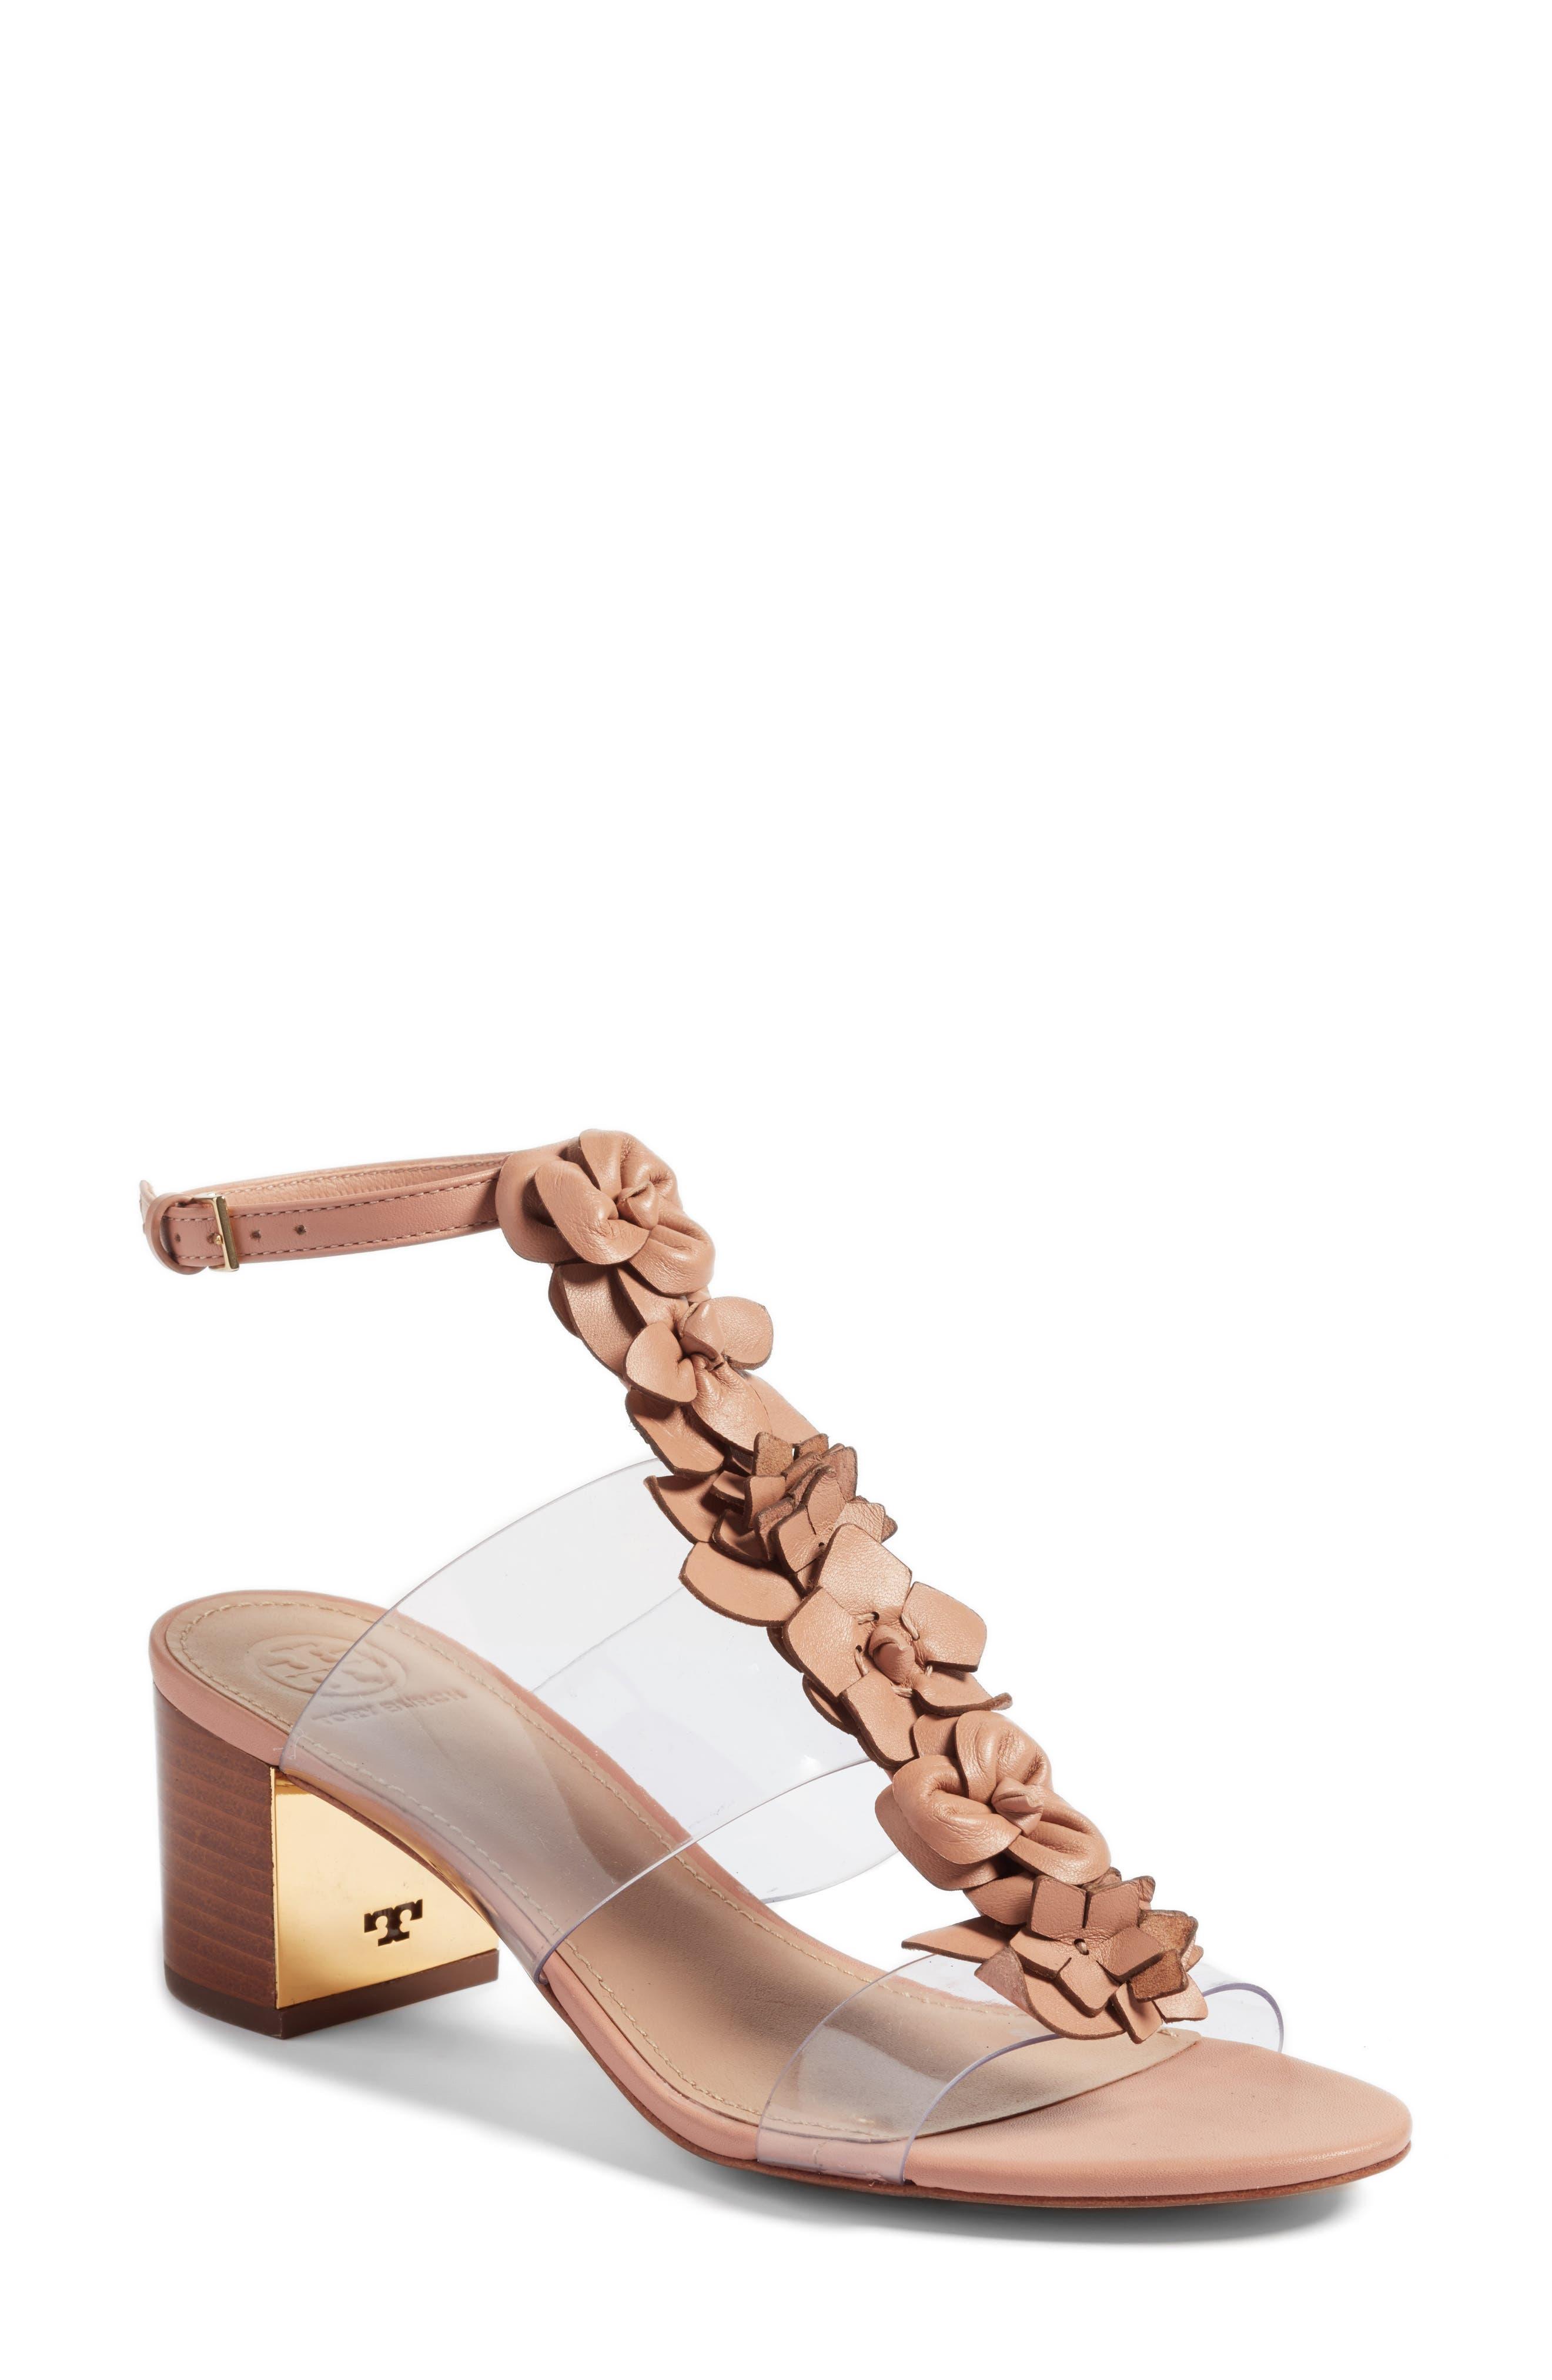 Blossom Sandal, Main, color, 250